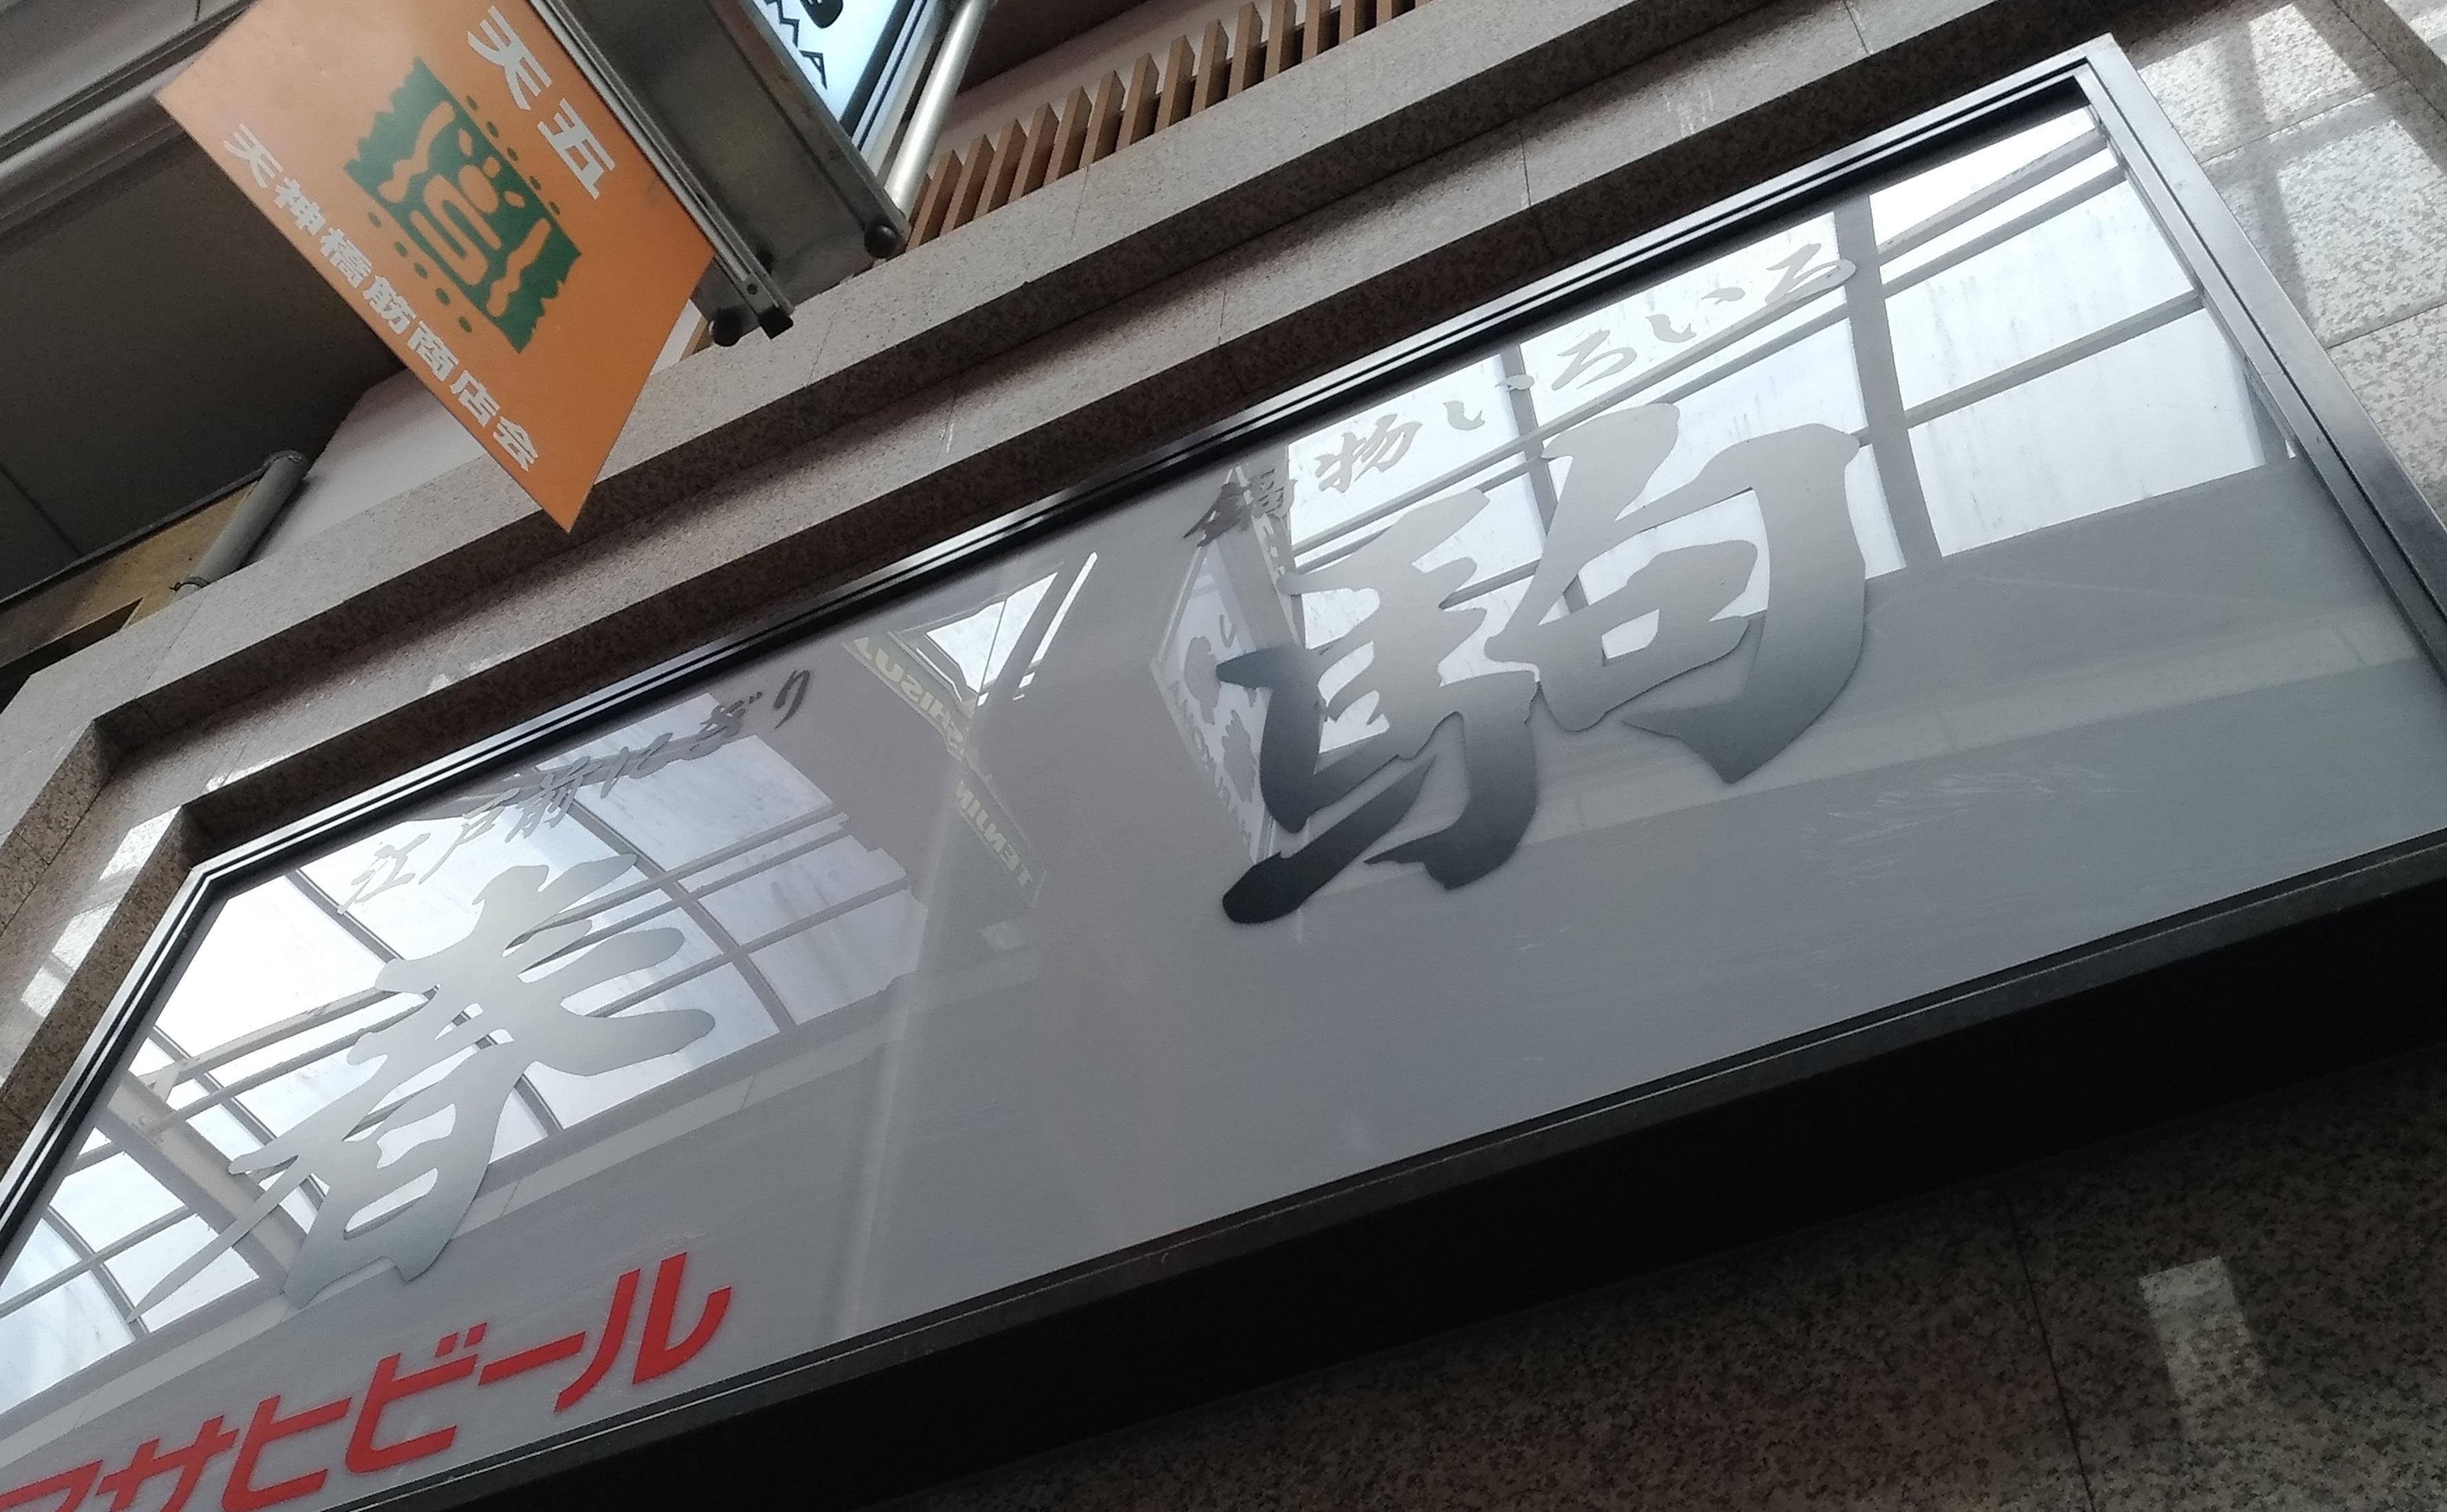 harukoma_sushi_osaka_tenma_2.jpg